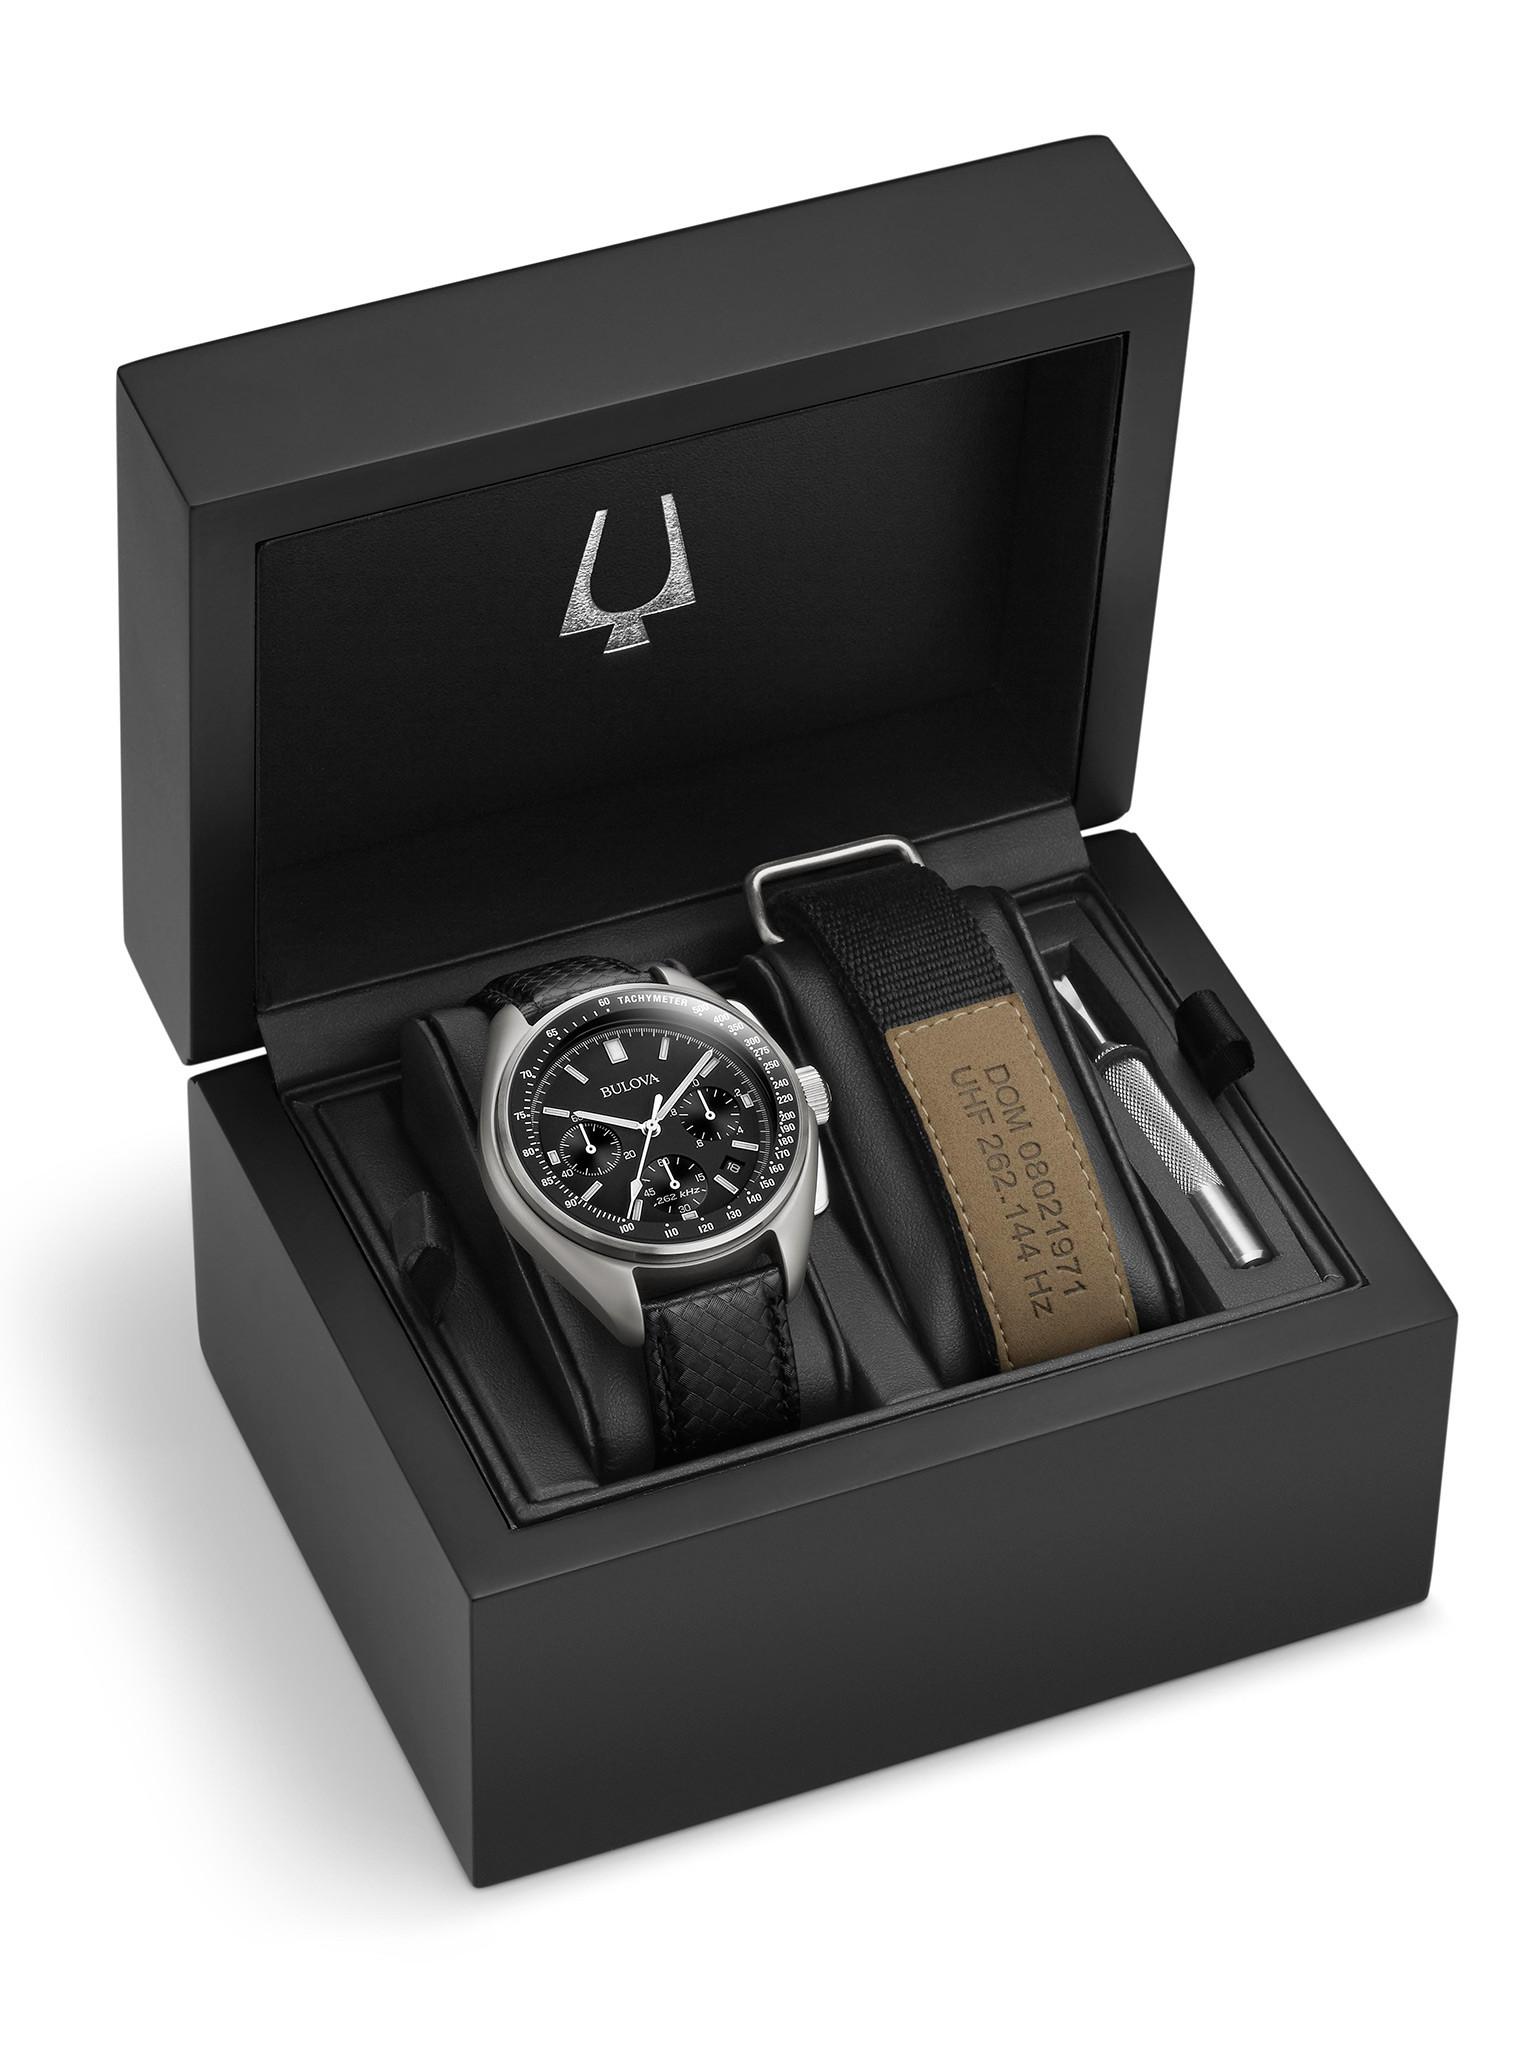 Cheap Replica Bulova Special Edition Moonwatch Men's Watch 96B251 Review